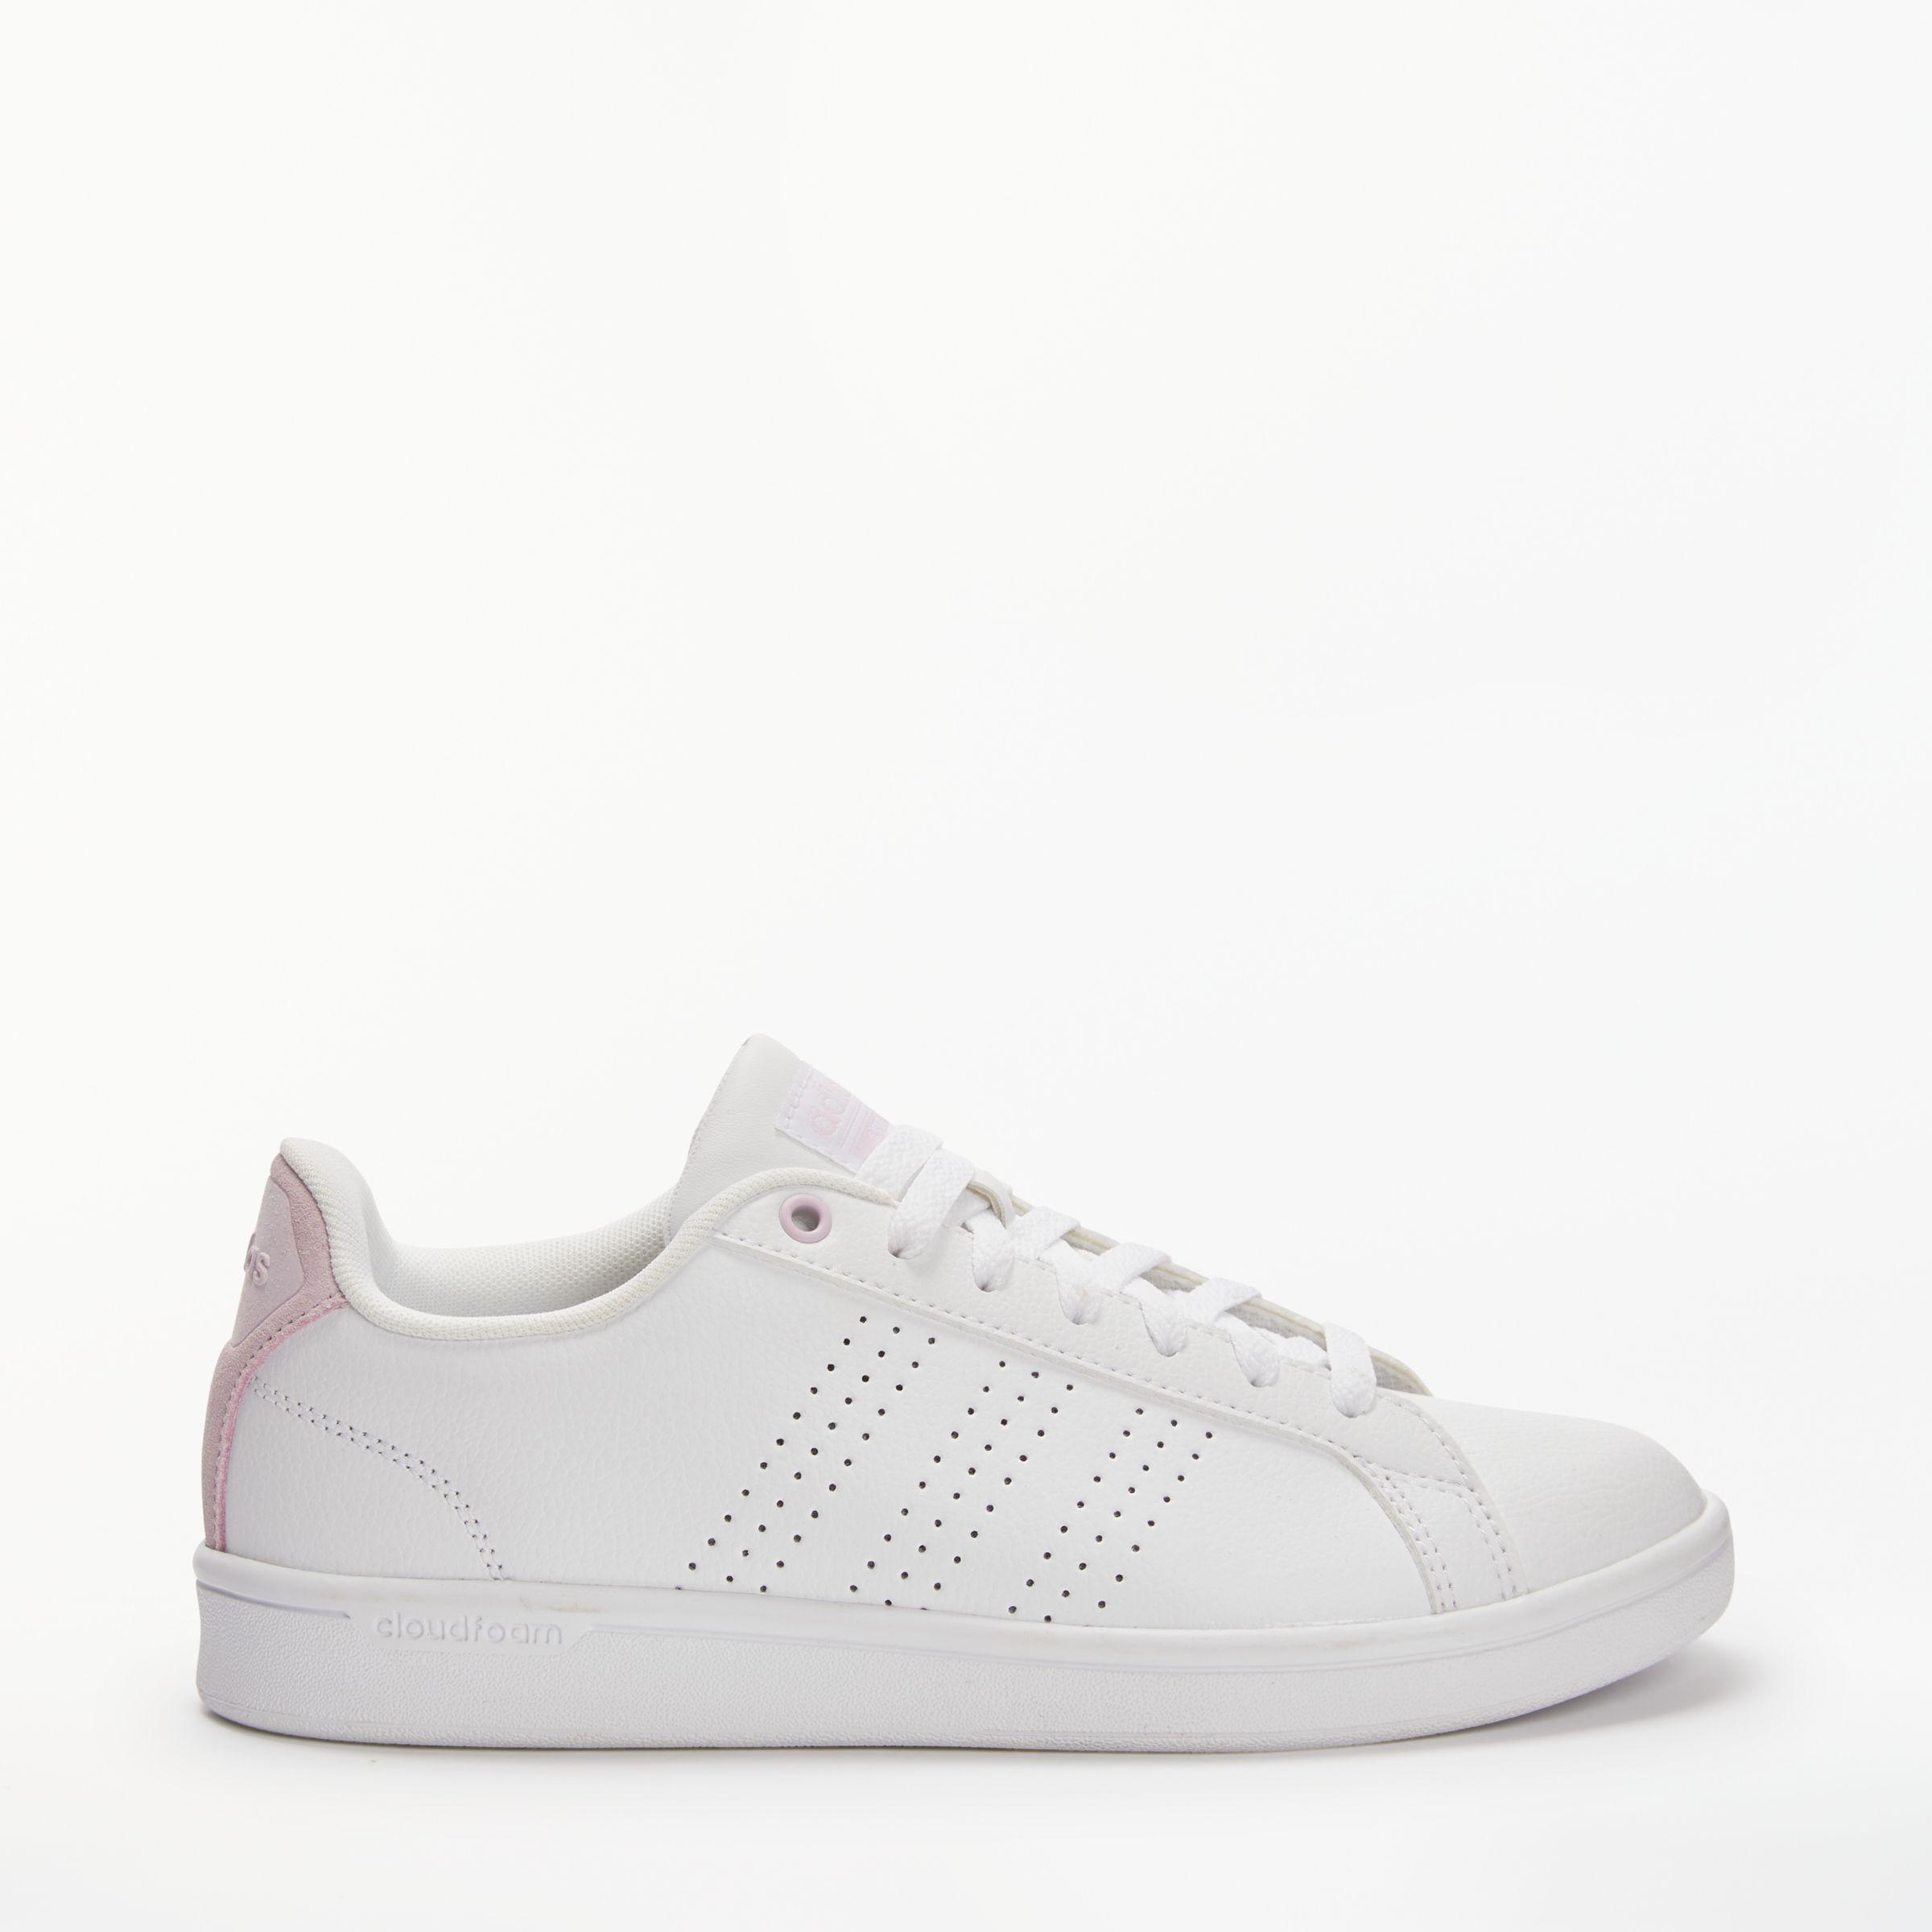 adidas cloudfoam advantage pink cheap online